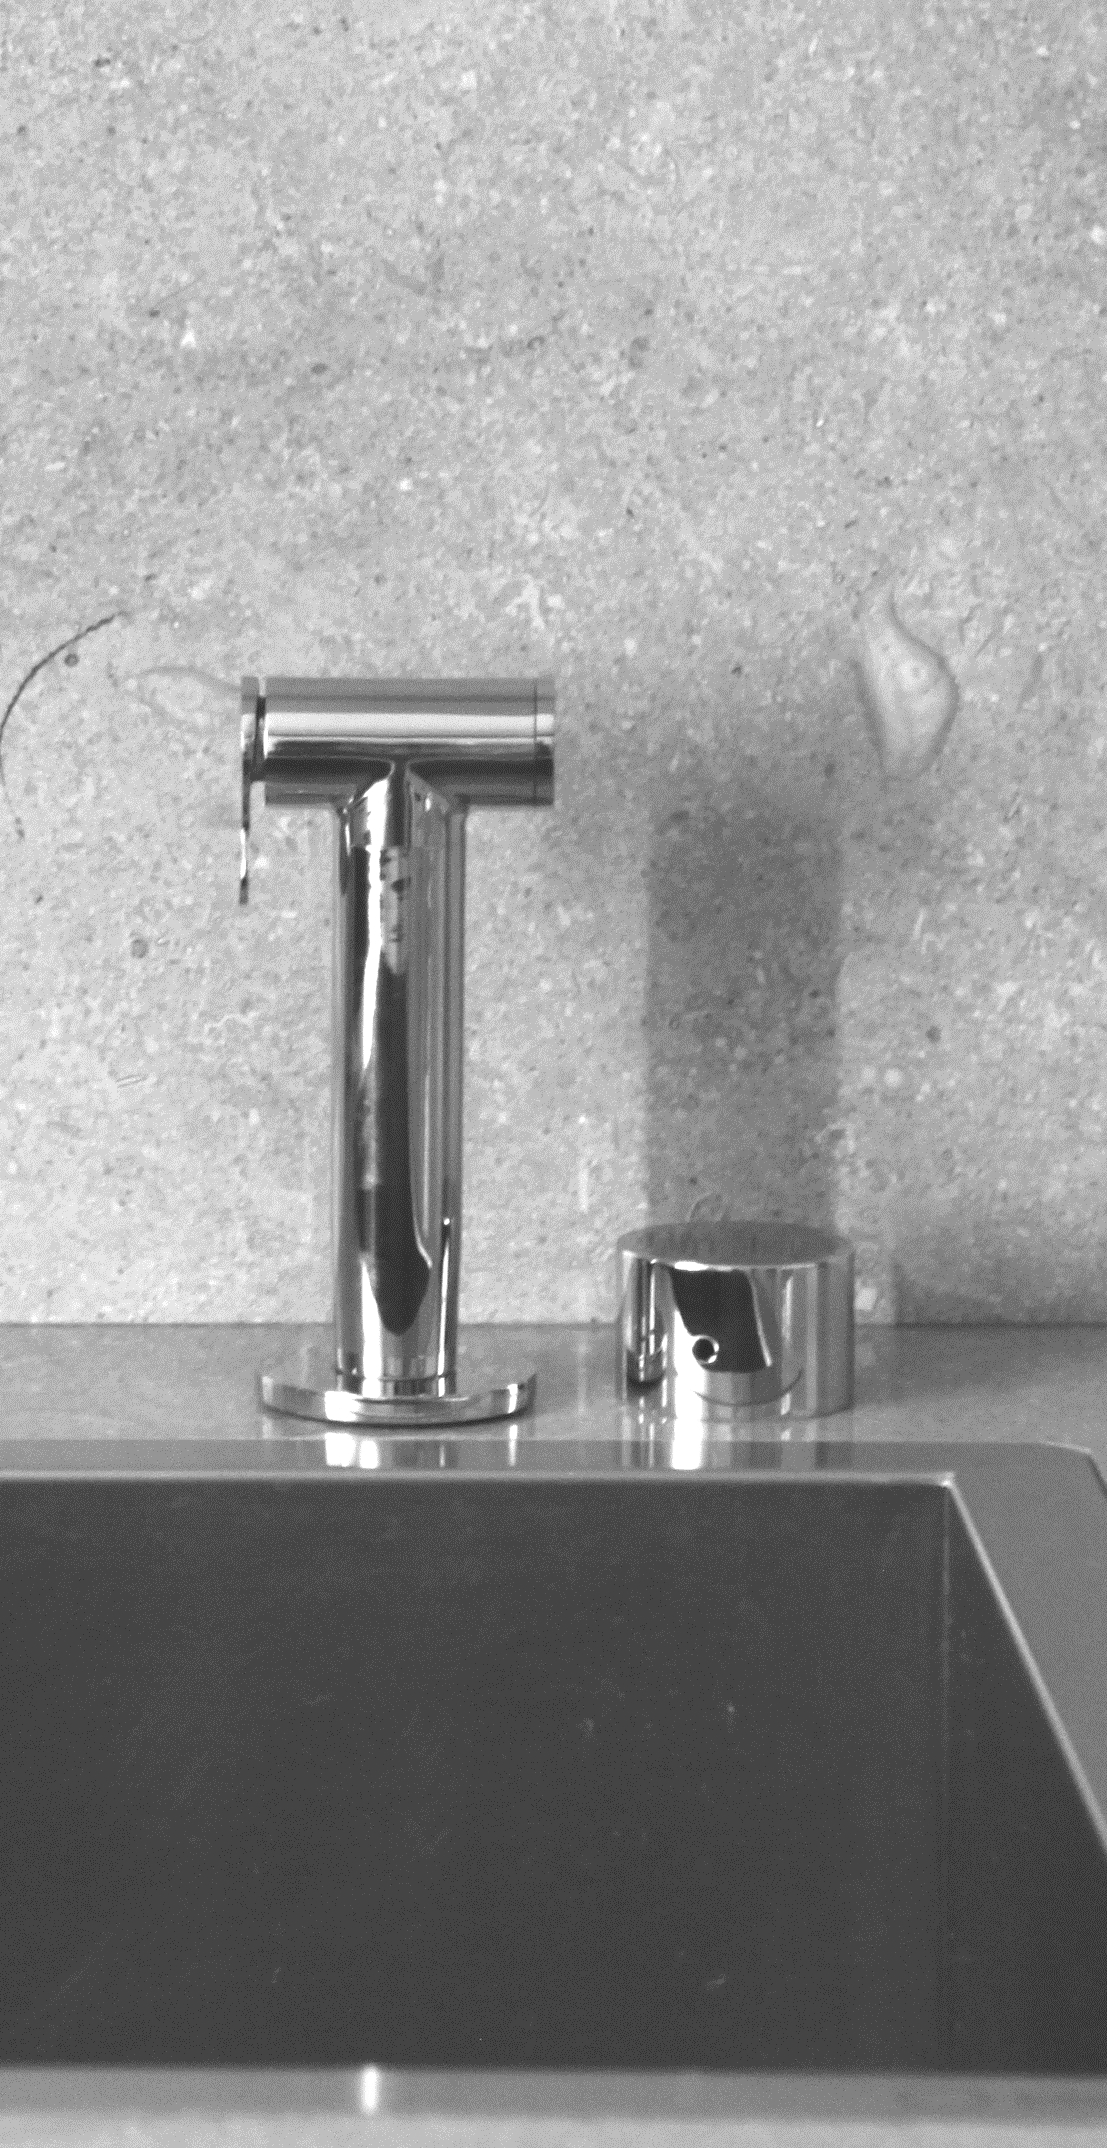 Cucina bagno arvag - Doccette per bagno ...